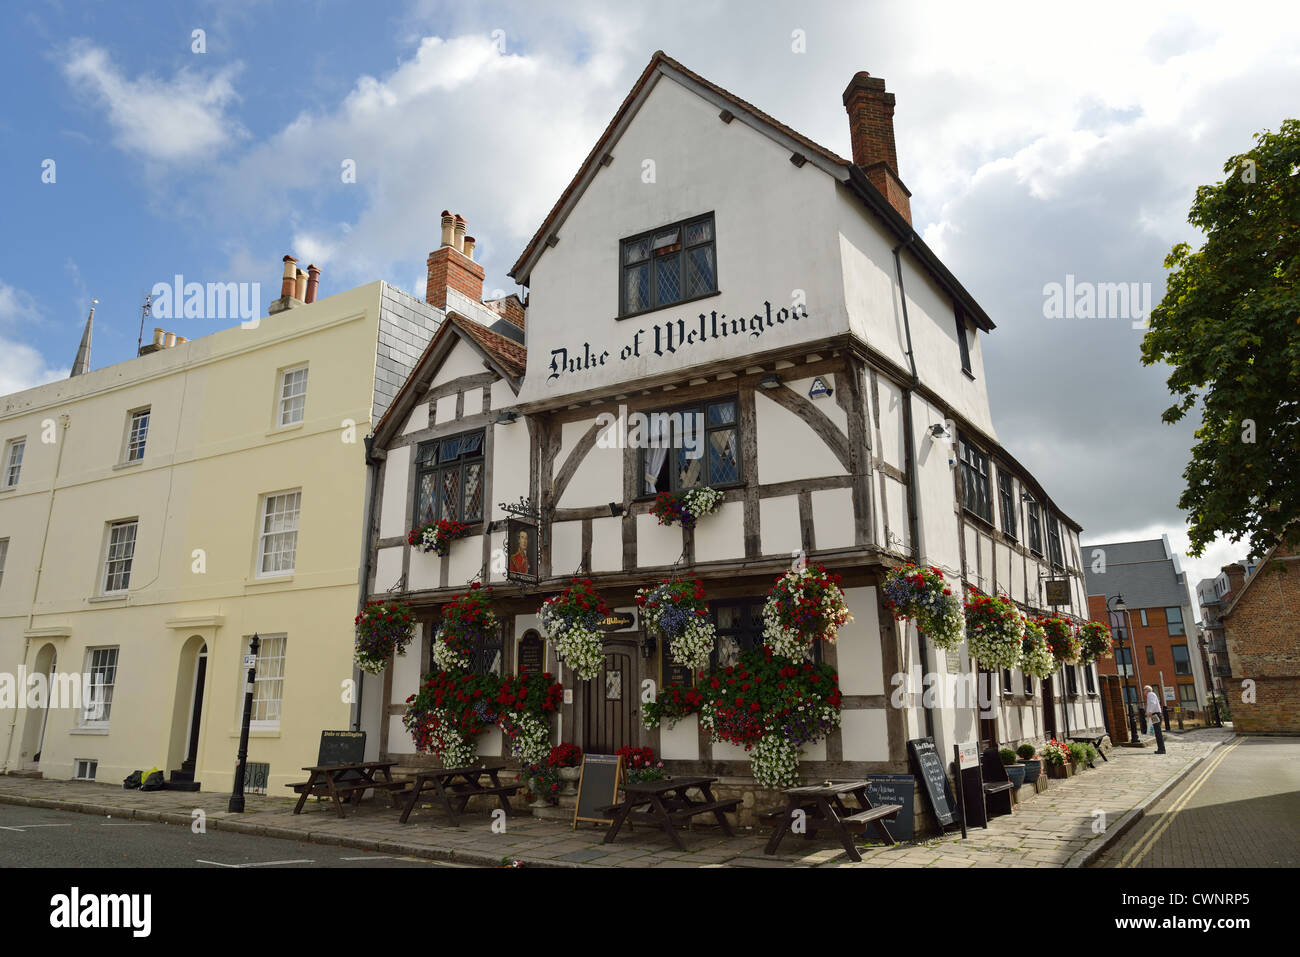 13th century Duke of Wellington Pub, Bugle Street, Old City, Southampton, Hampshire, England, United Kingdom - Stock Image